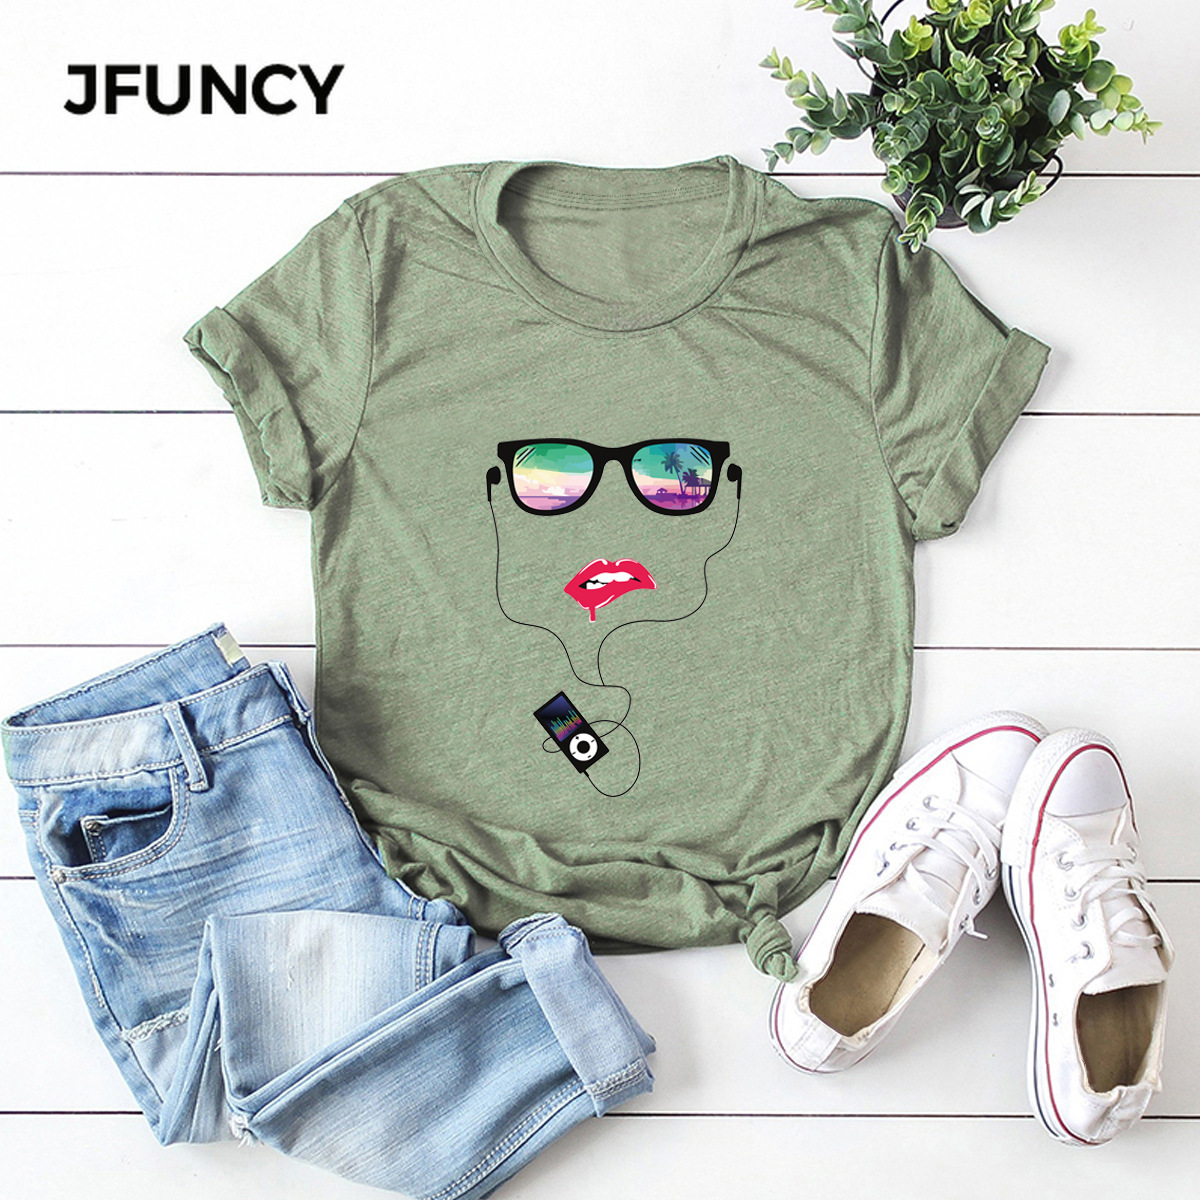 JFUNCY New Abstract Human Face Graphic Printed Tshirt 100% Cotton Summer Woman T-shirt Plus Size Short Sleeve Women Shirts Tops